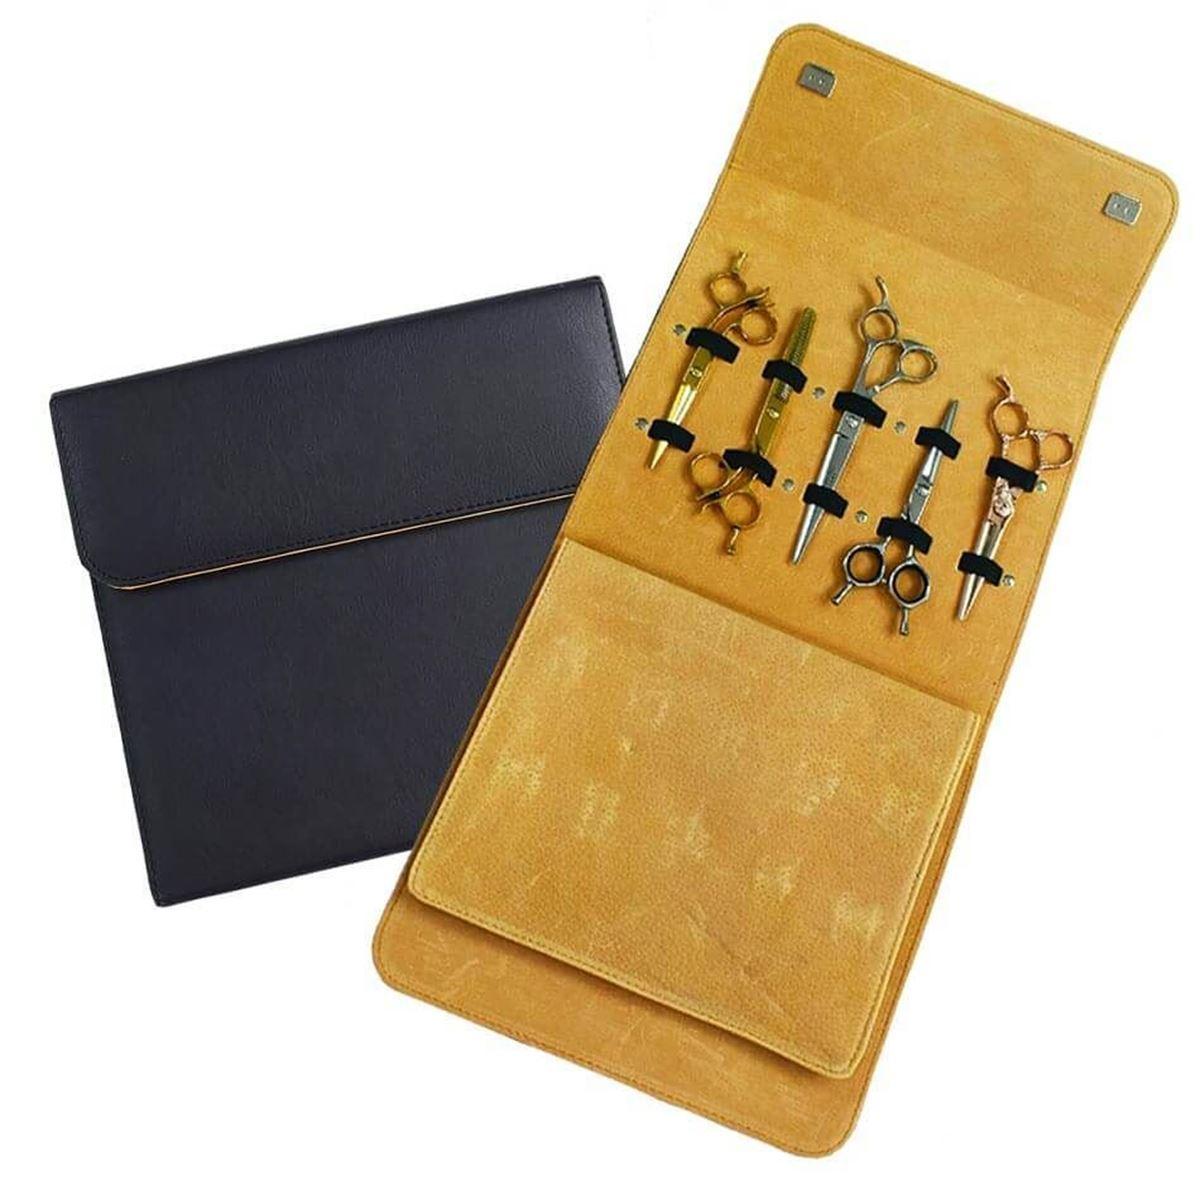 Picture of Matakki Leather Scissor Case Holds 10 pcs